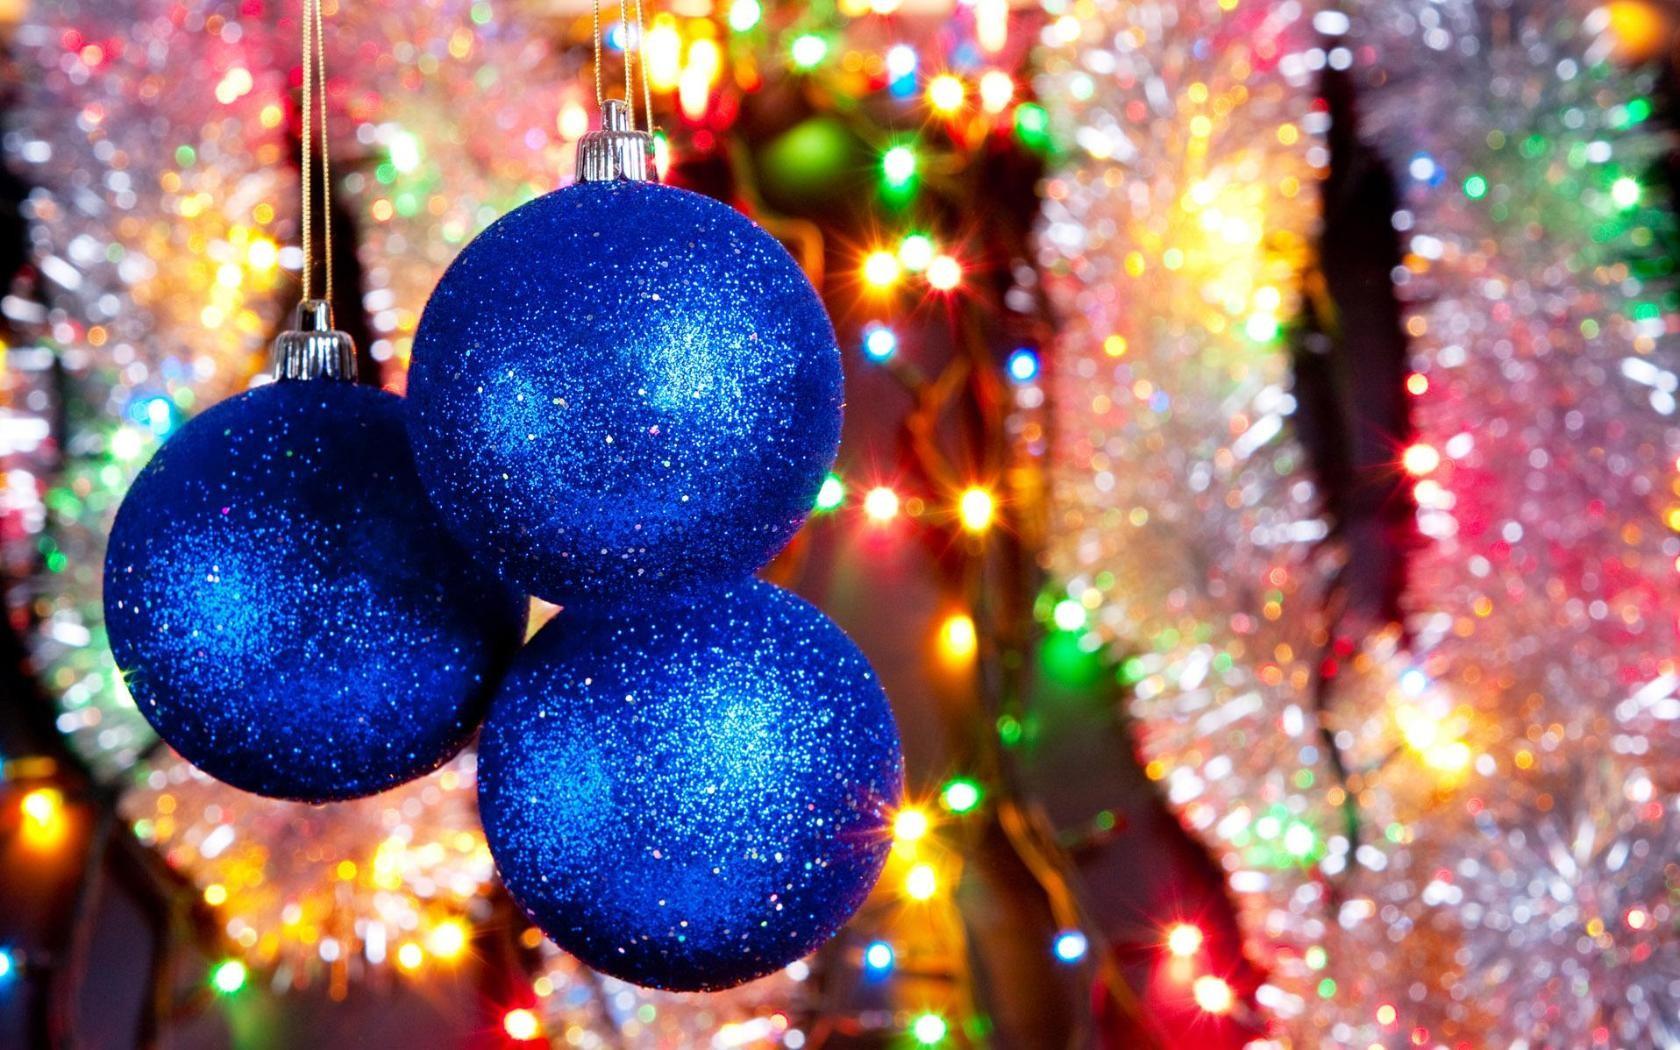 Bolas azules para arbol de navidad - 1680x1050